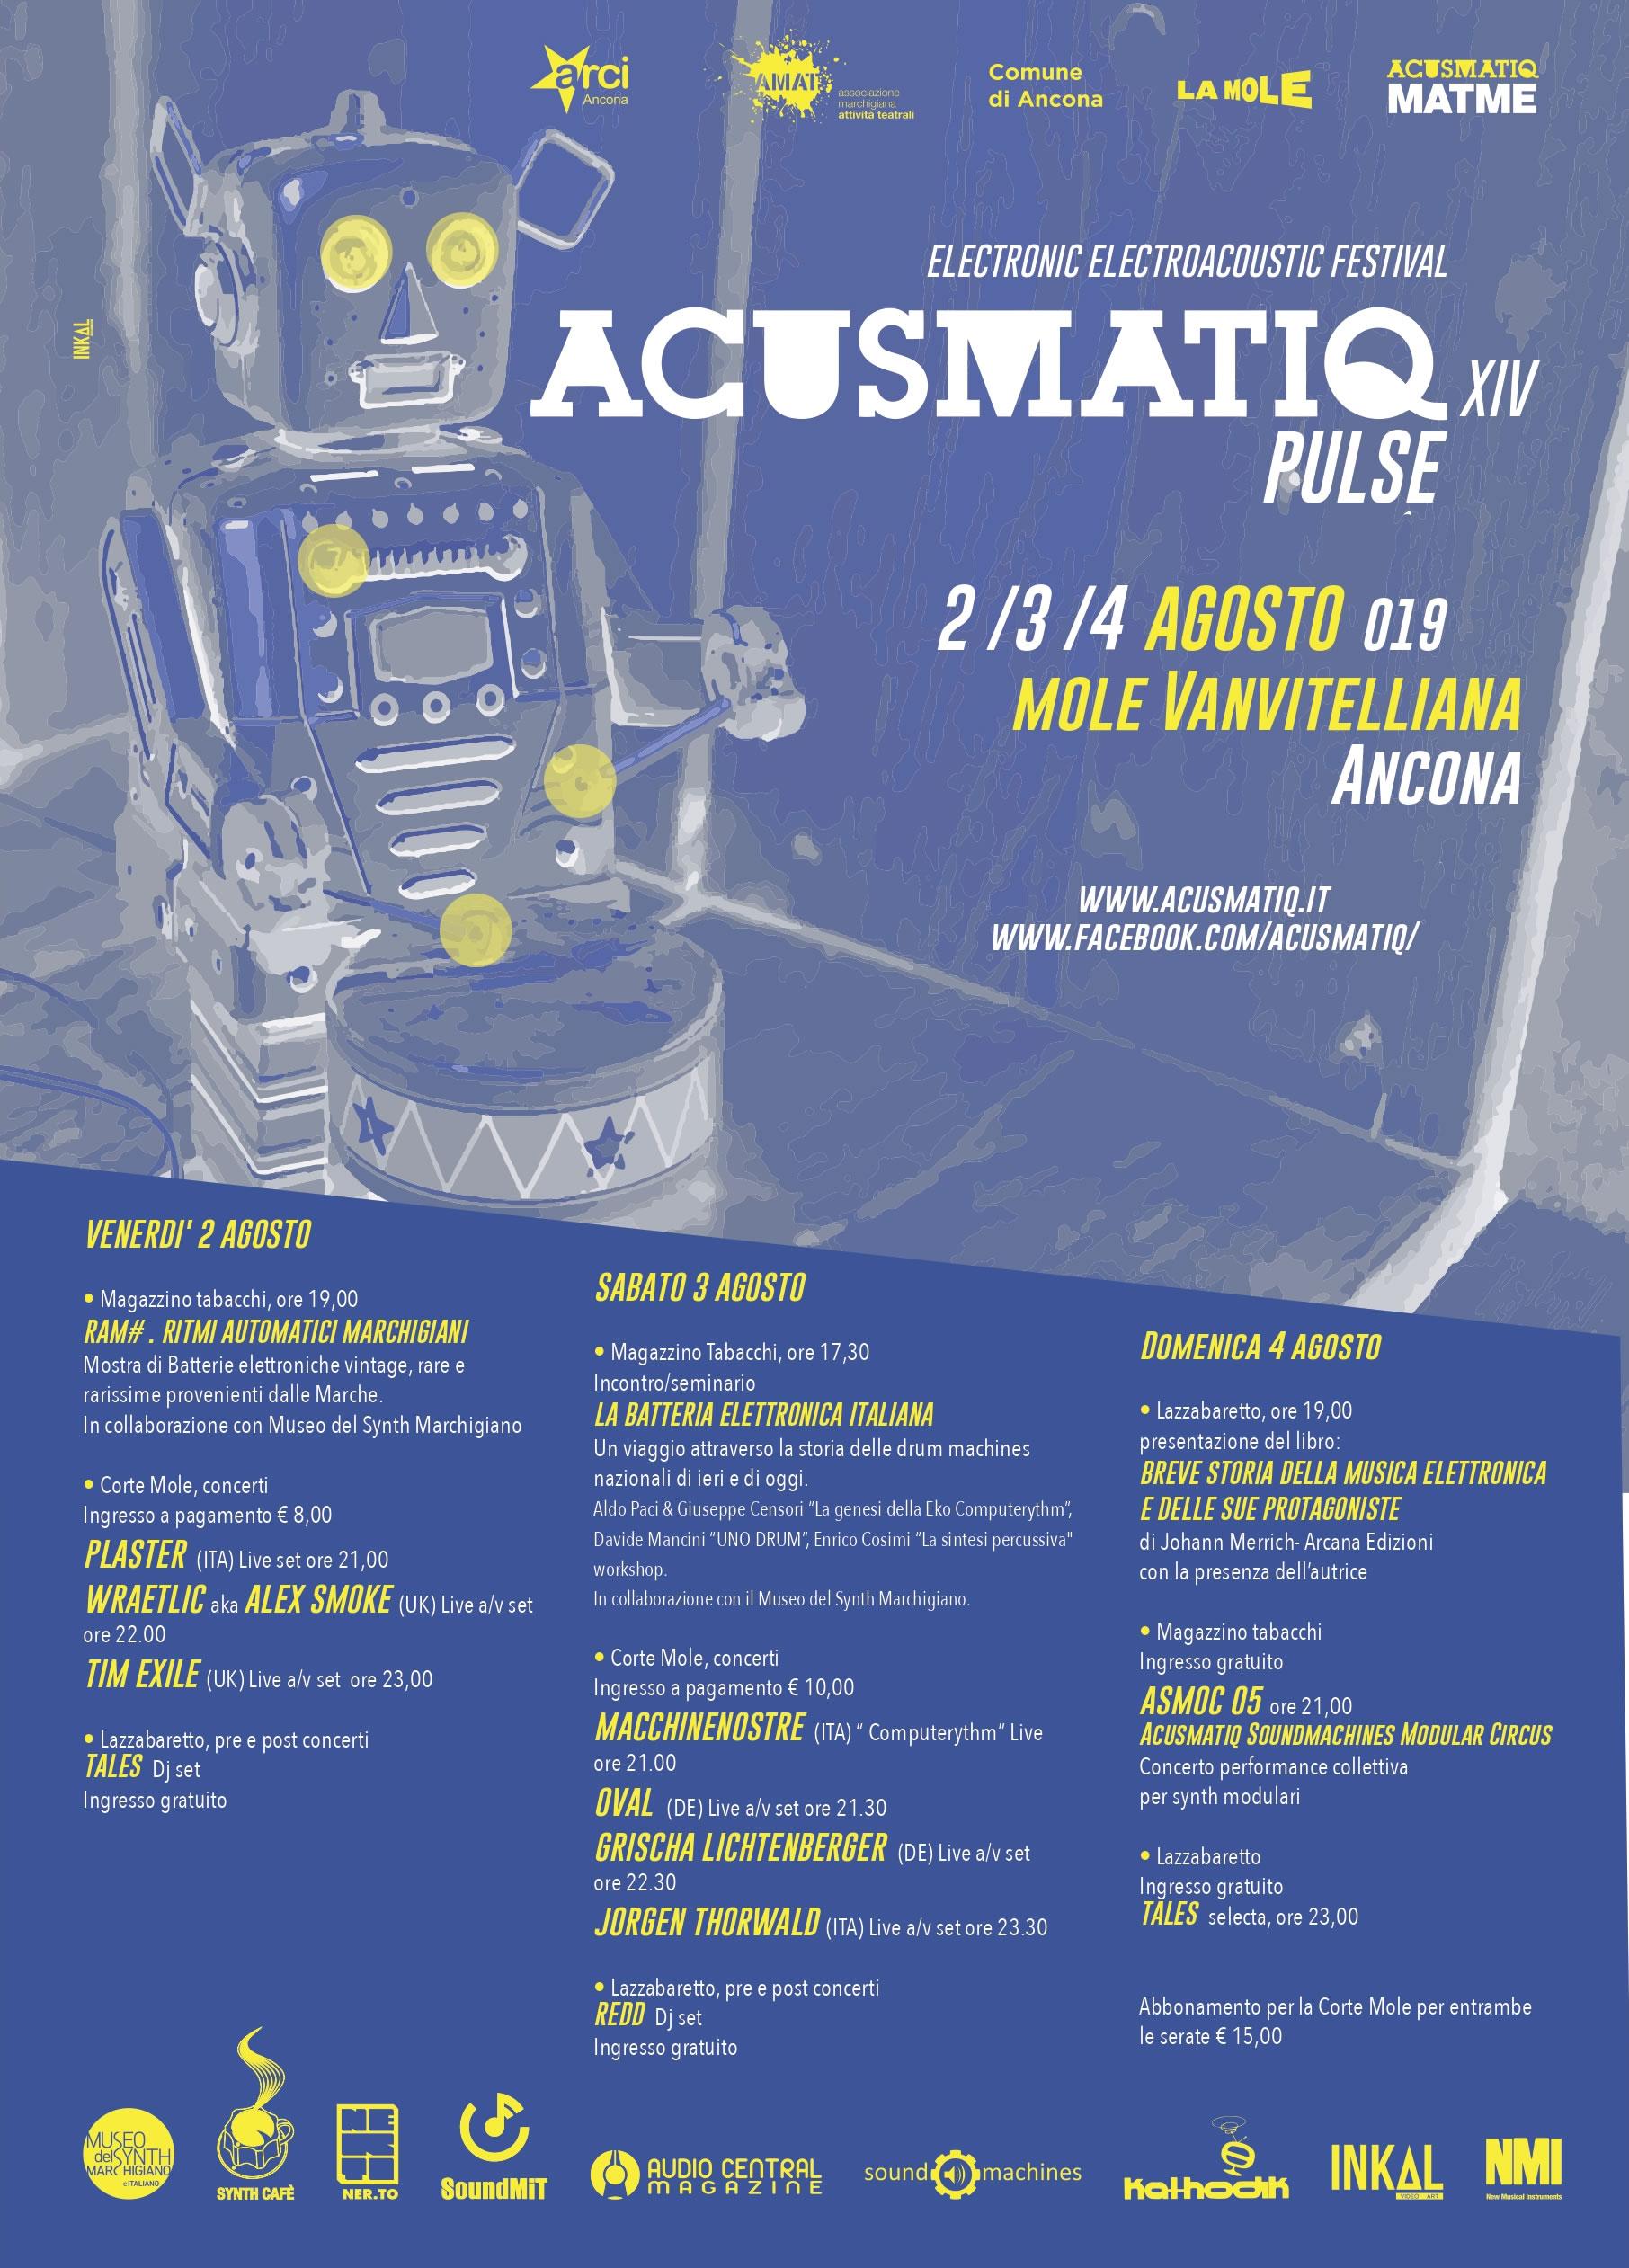 Acusmatiq pulse